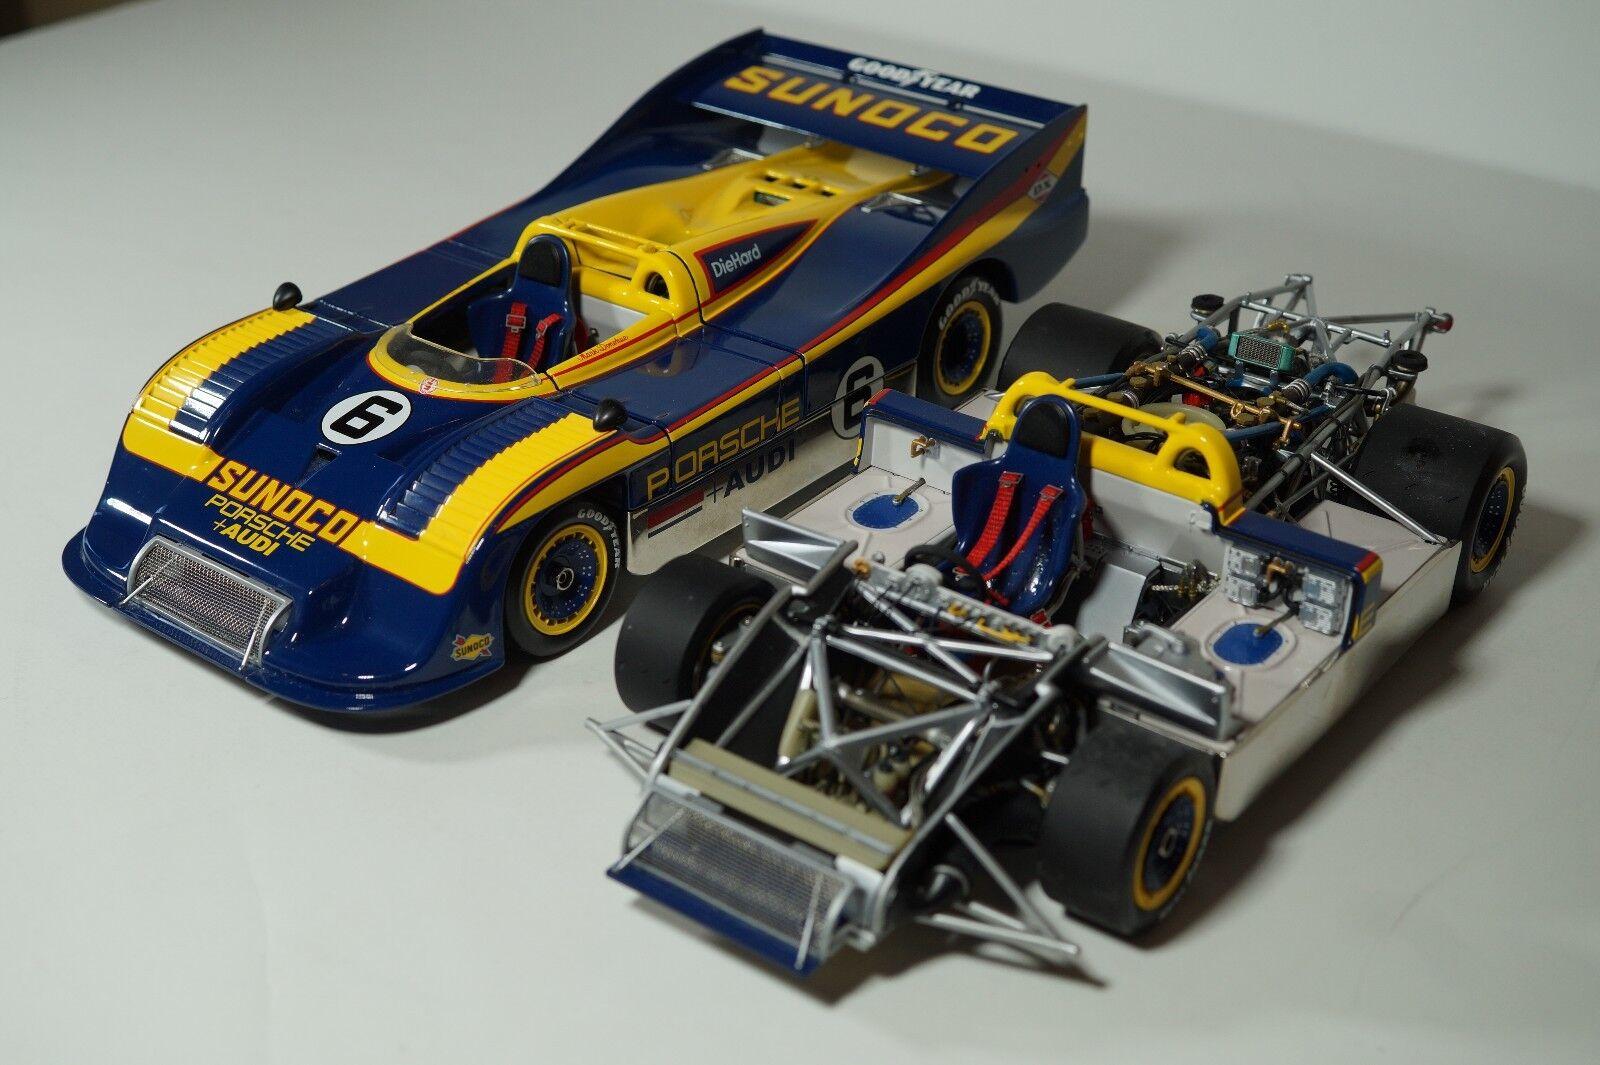 Exoto RLG RLG RLG 18181 First Heat set 1973 Porsche 917 30KL w Bonus Chassis - Donohue b07014